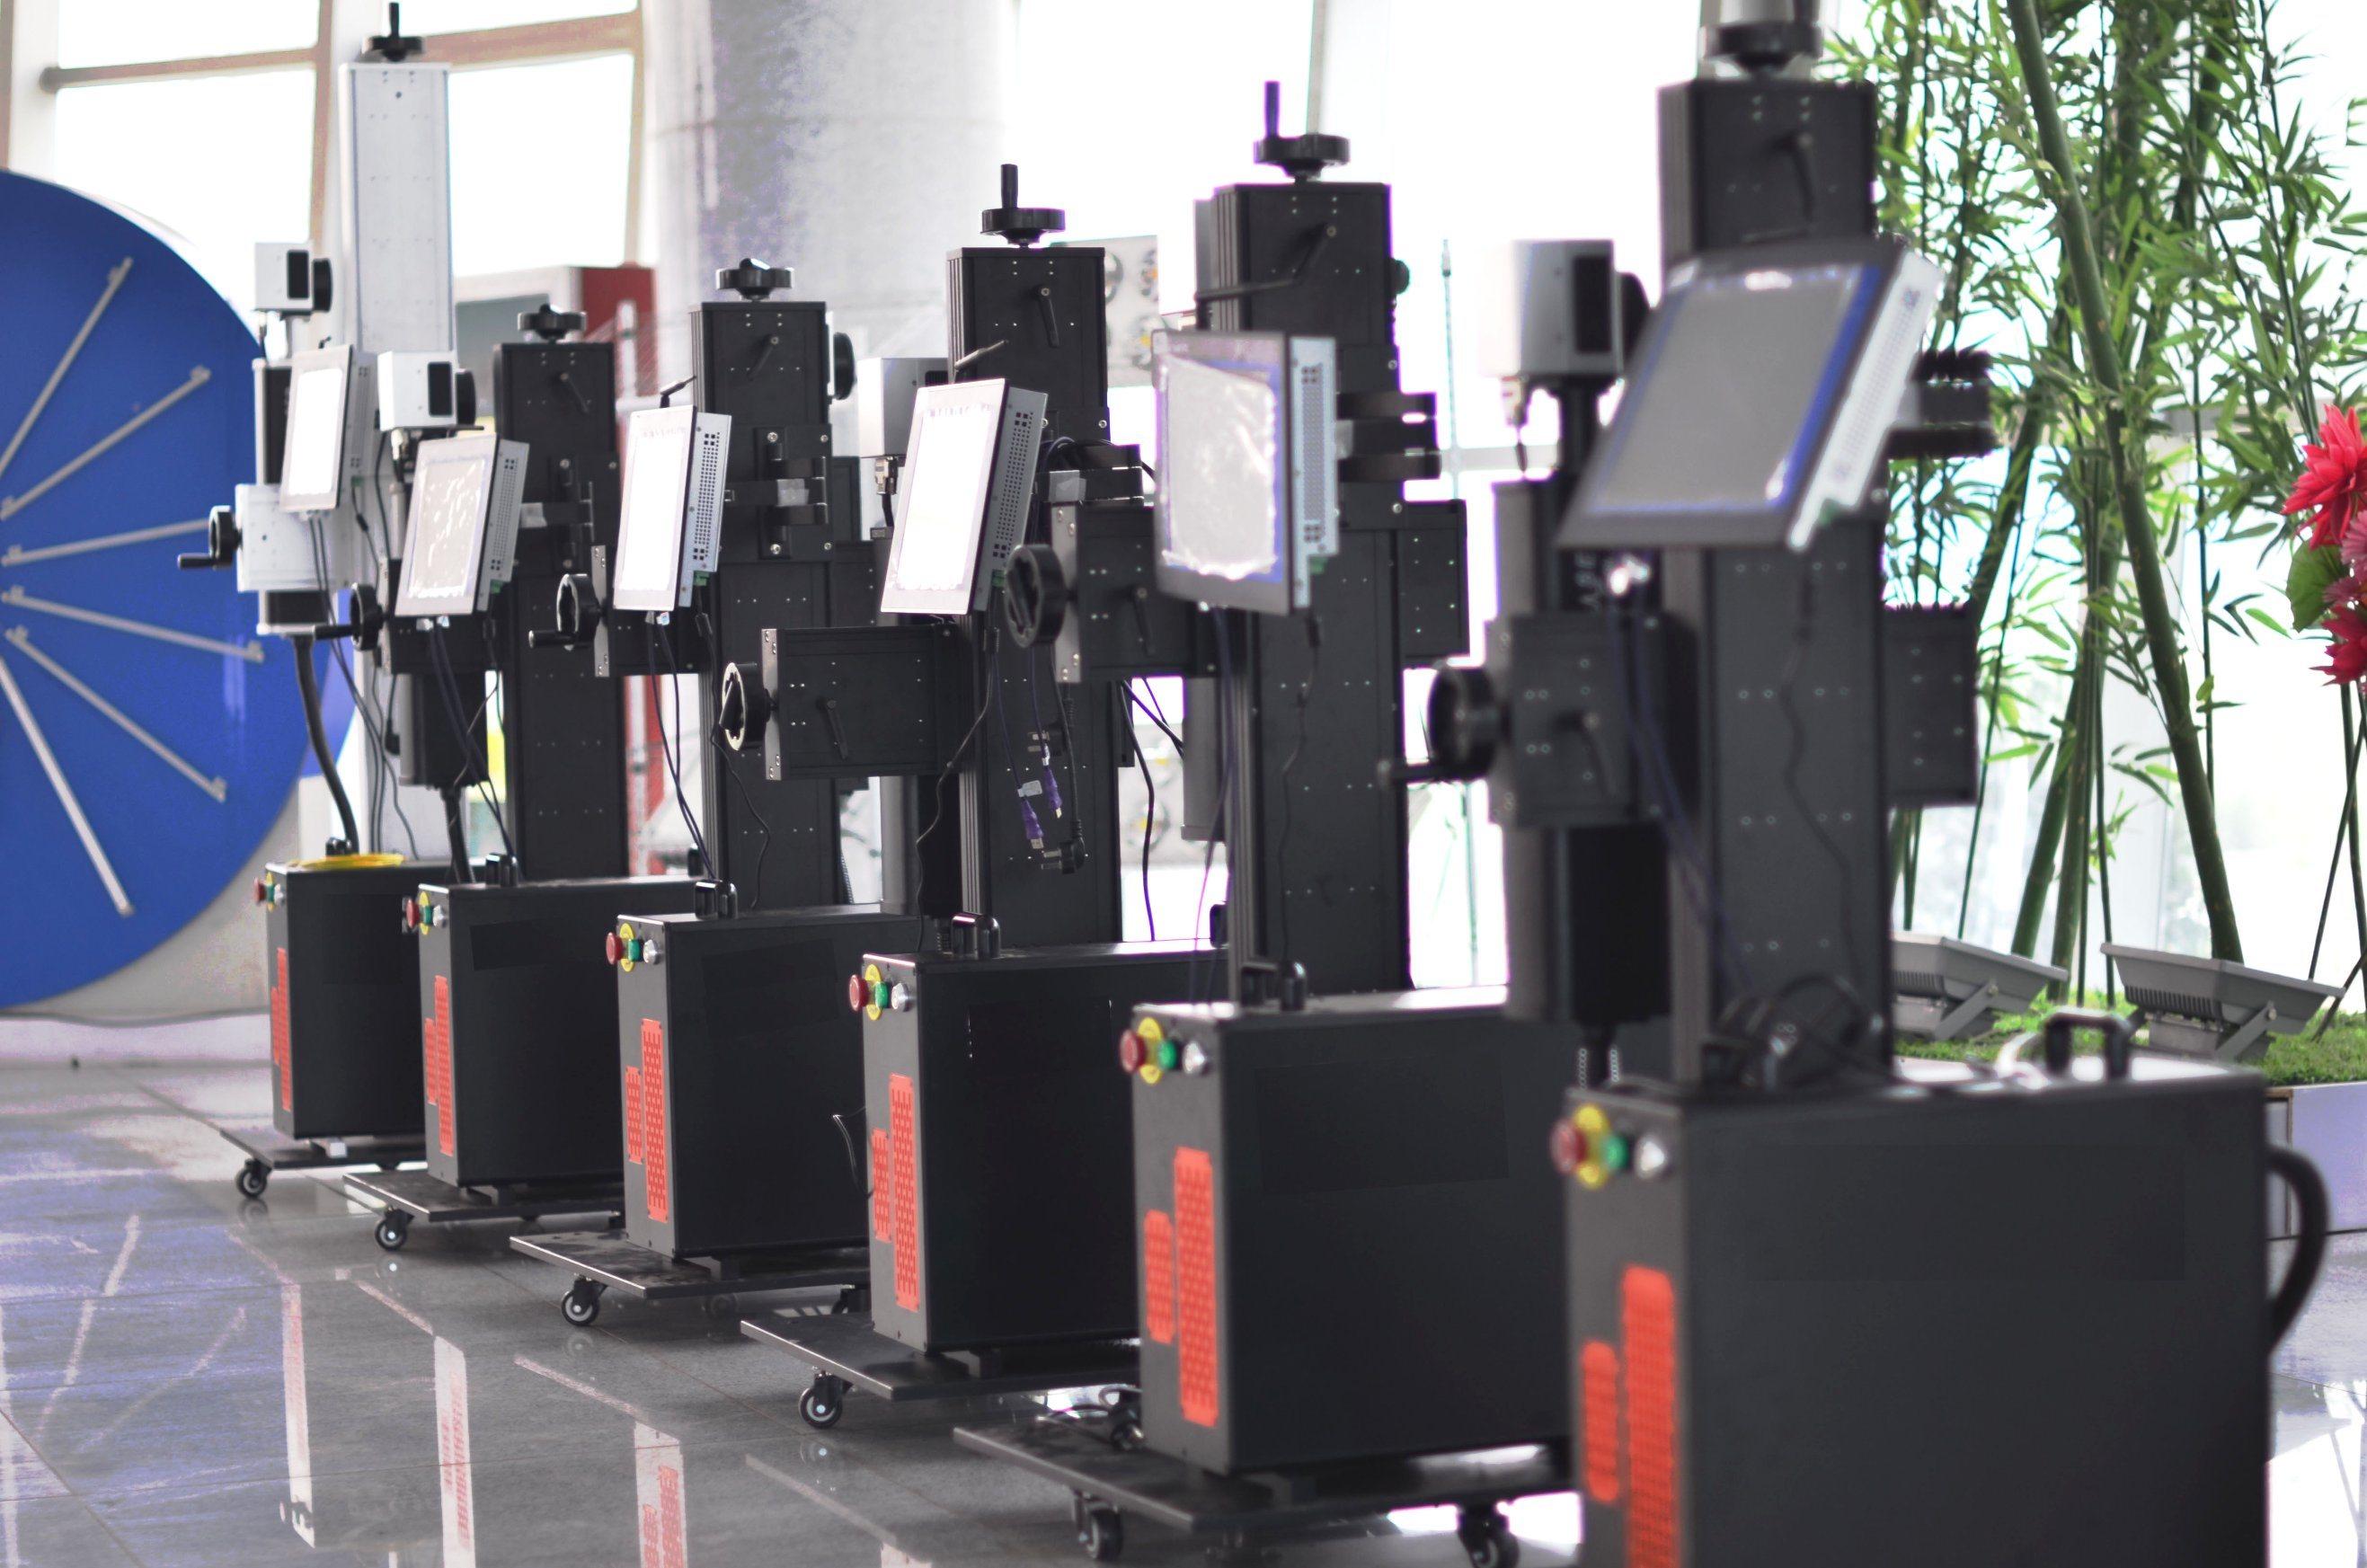 50W Ylpf-50qe Fiber Laser Marking Machine for PP/PVC/PE/HDPE/UPVC/CPVC Plastic Pipe Non-Metal